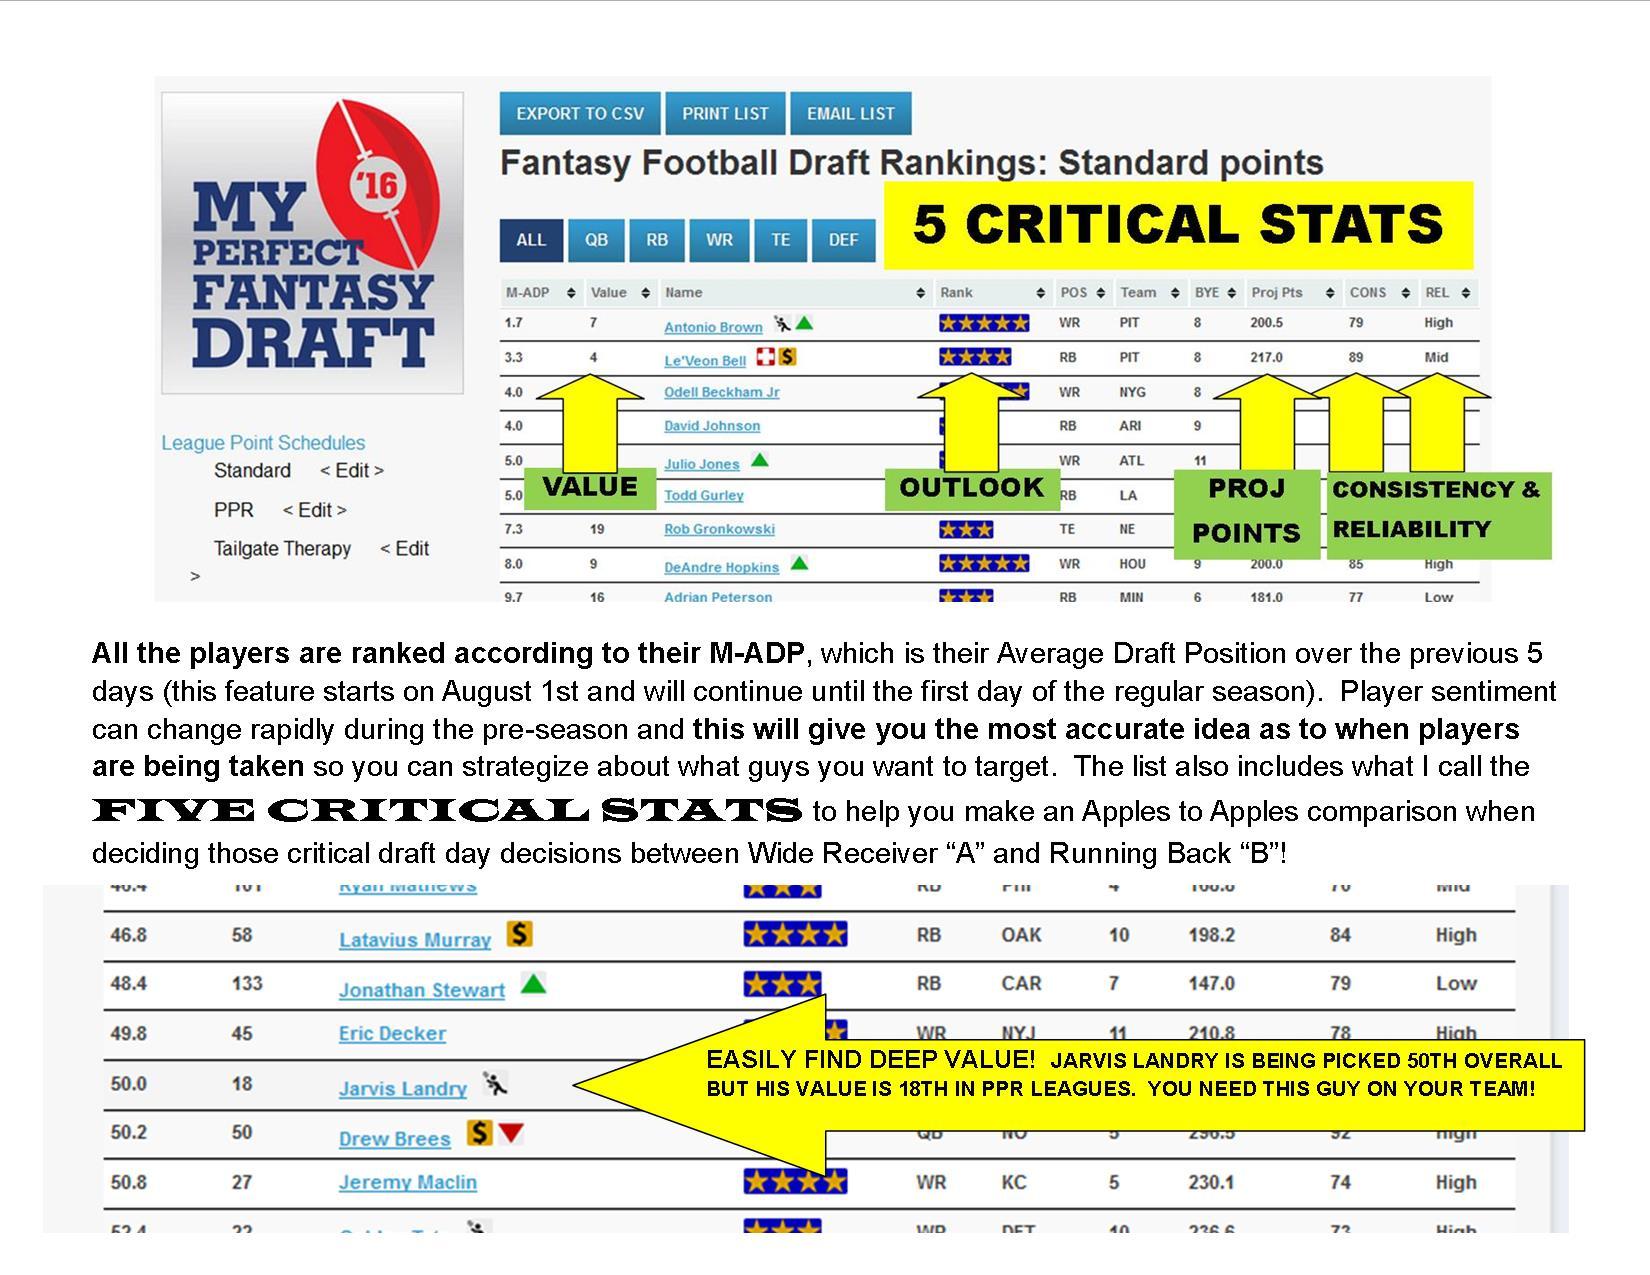 Five Critical Stats